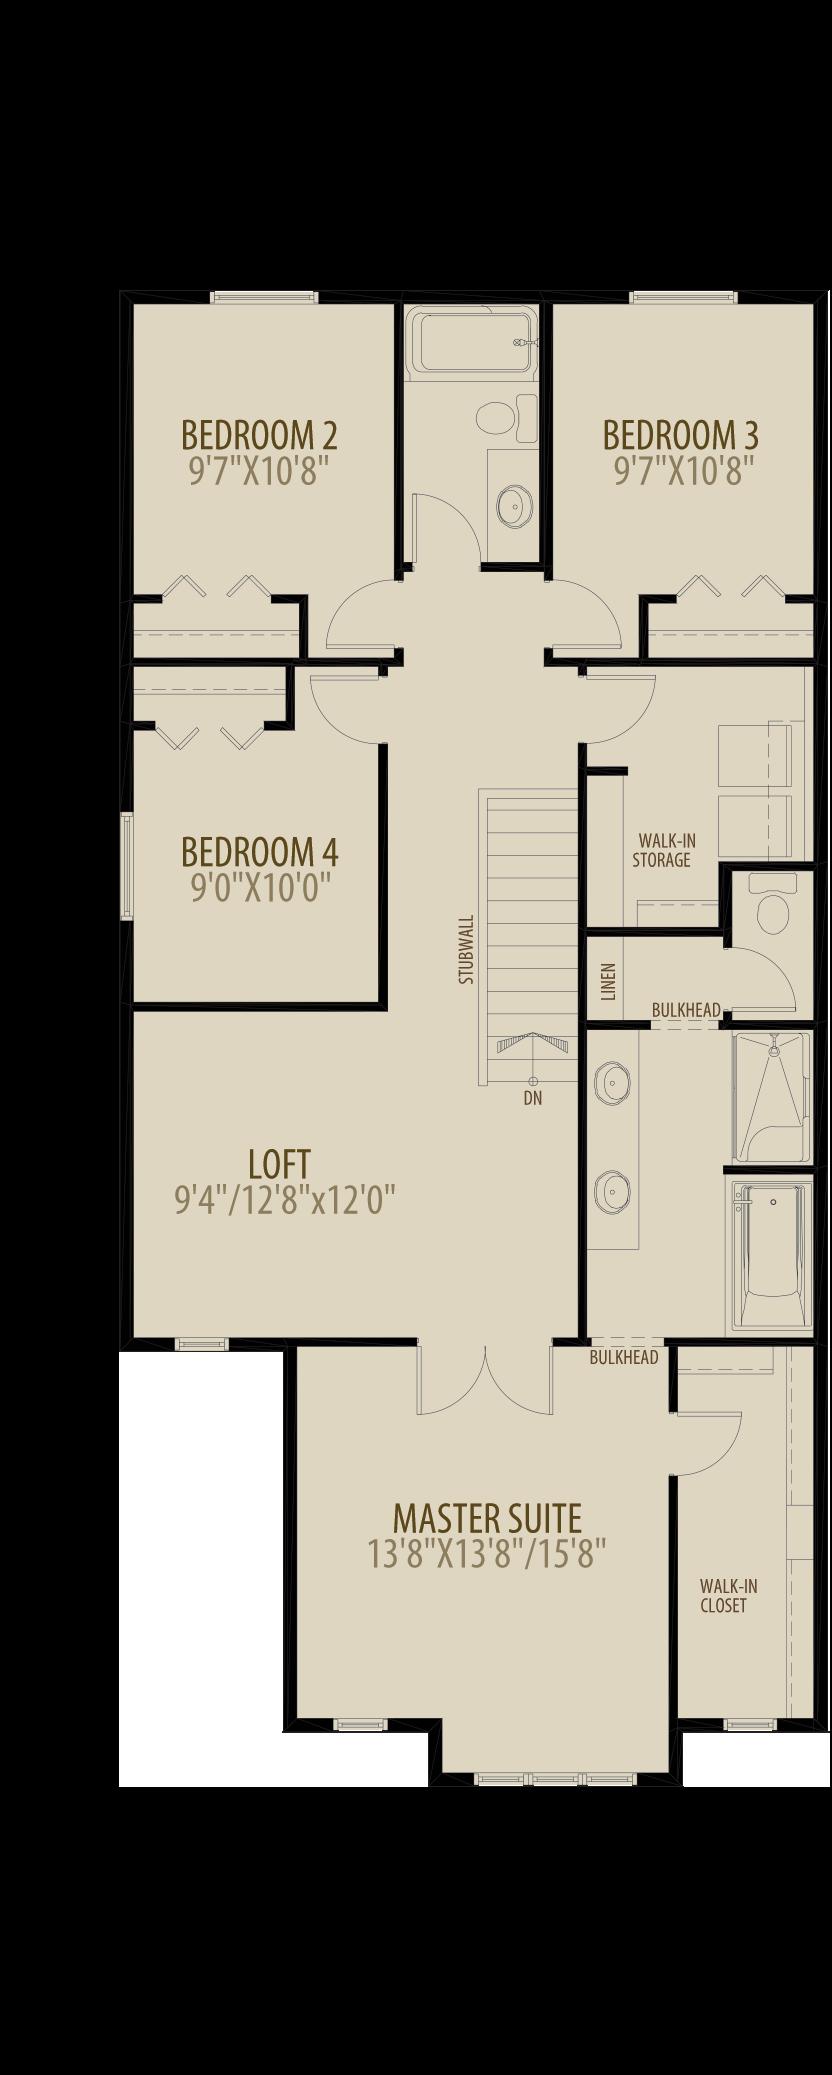 Revised Upper Floor 3 w 4th Bedroom adds 50 sq ft